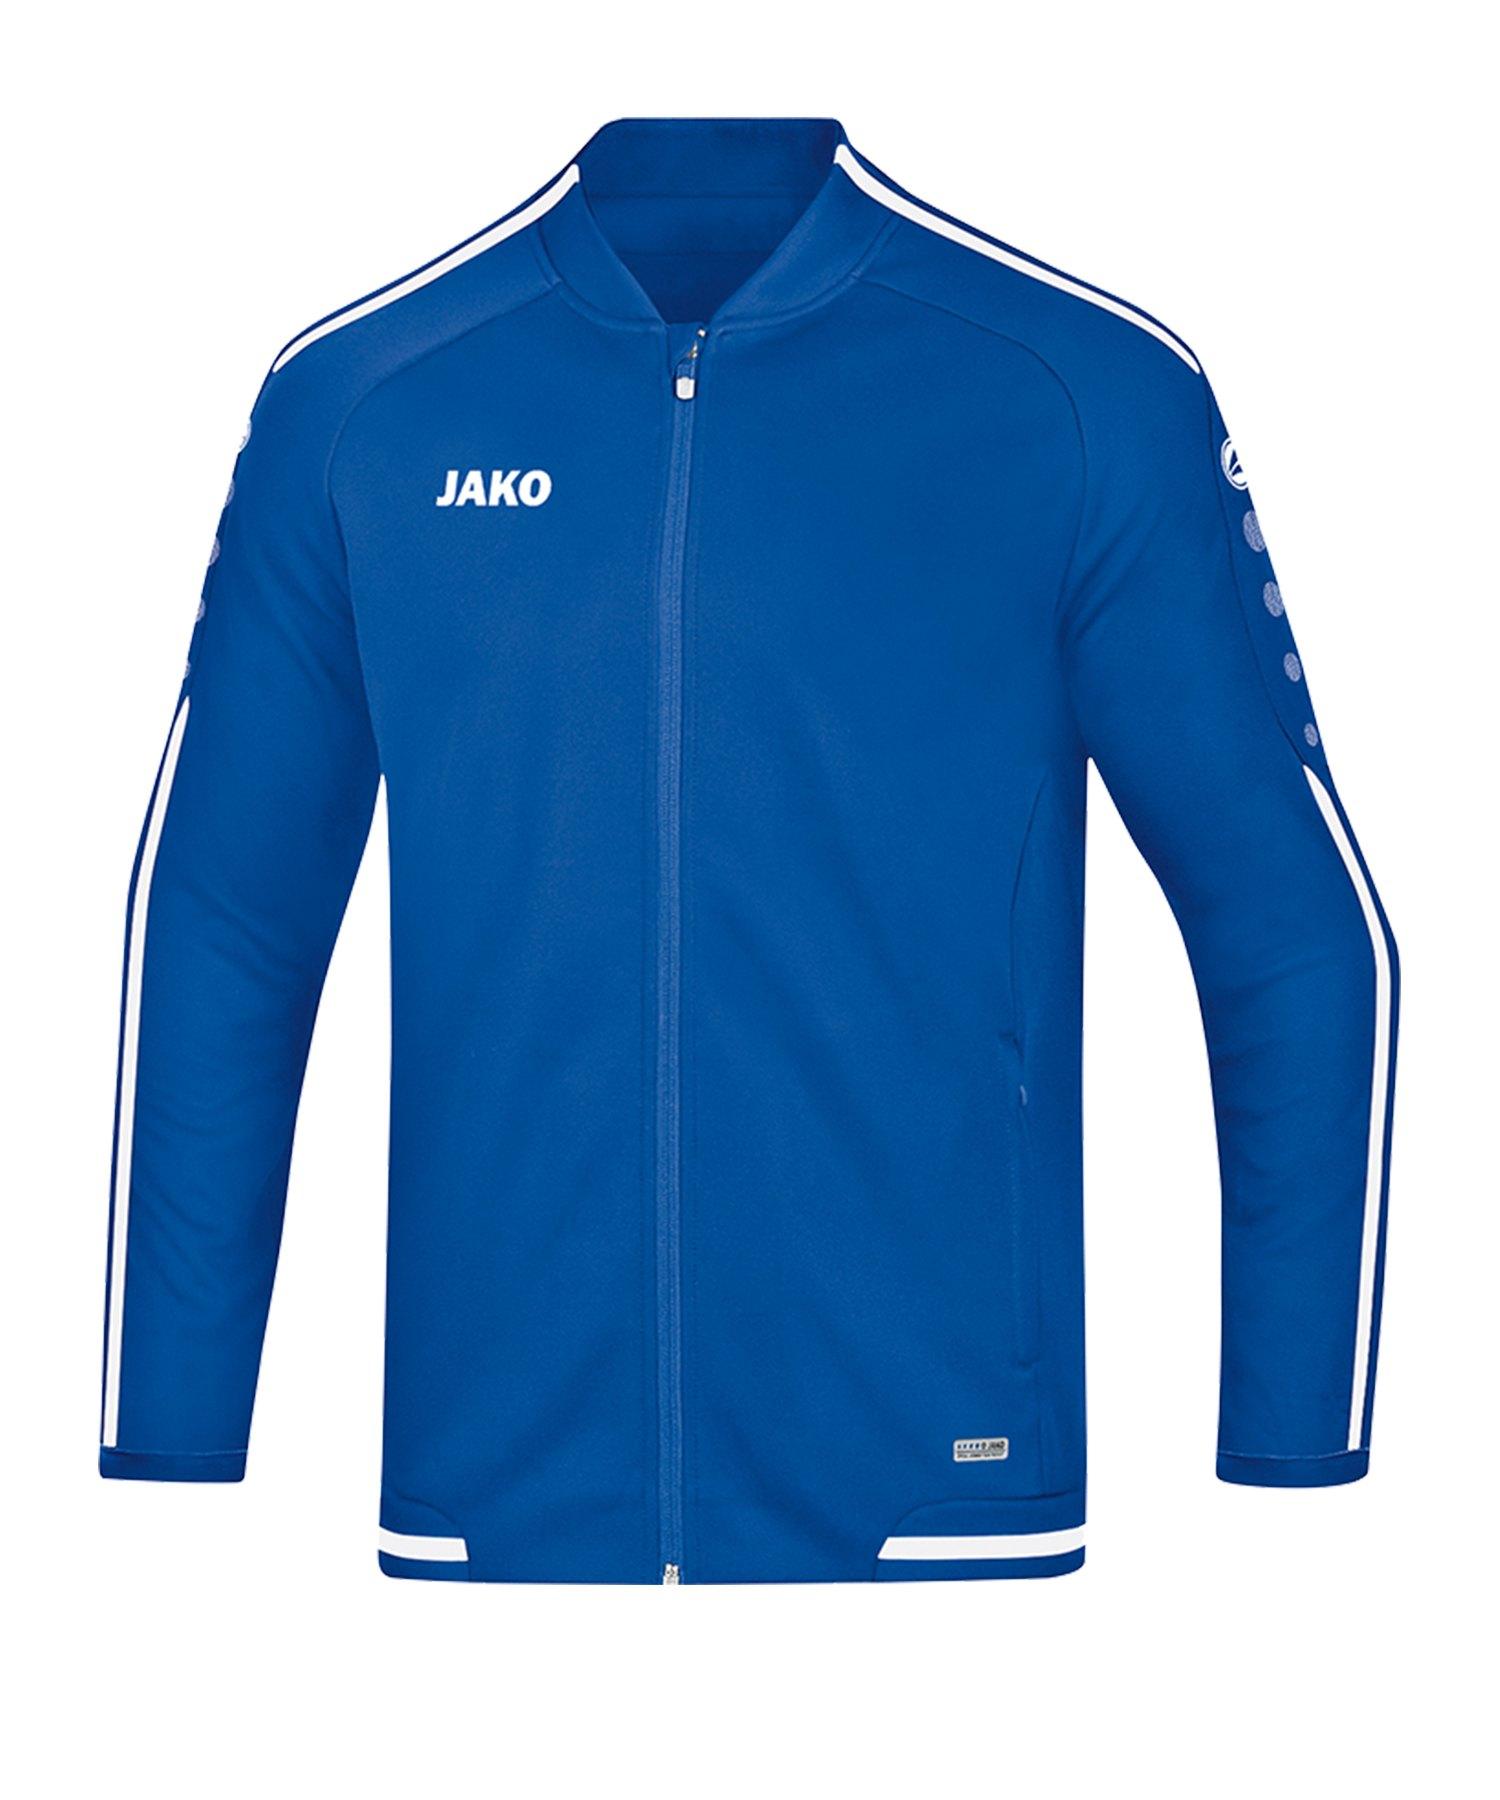 Jako Striker 2.0 Freizeitjacke Damen Blau F04 - Blau